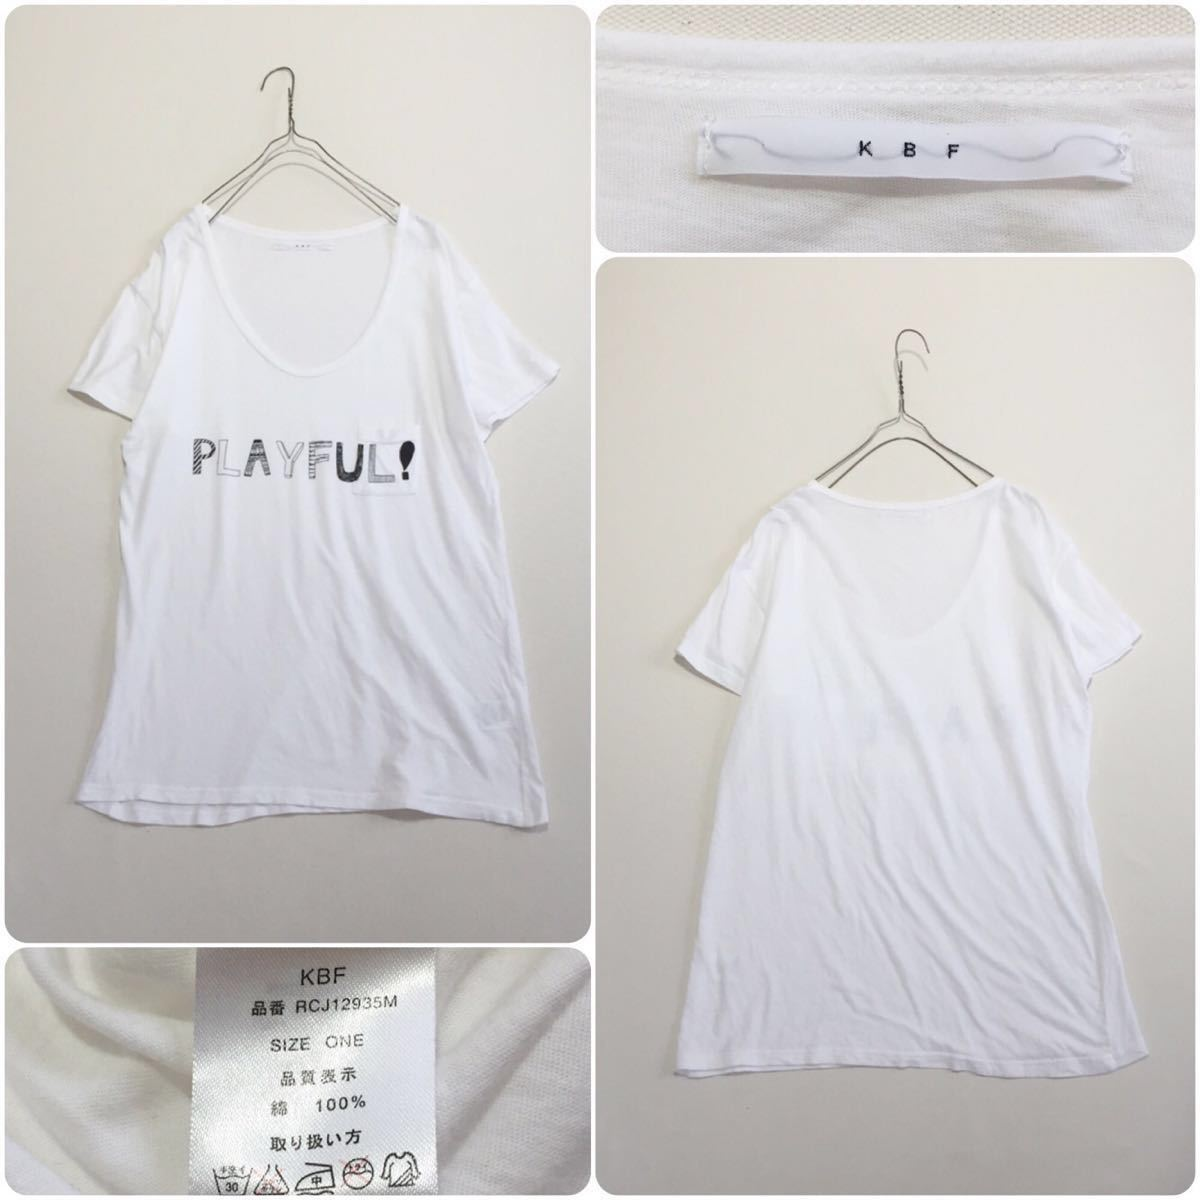 KBF . 胸ポケット ロゴ プリント 半袖 カットソー Tシャツ